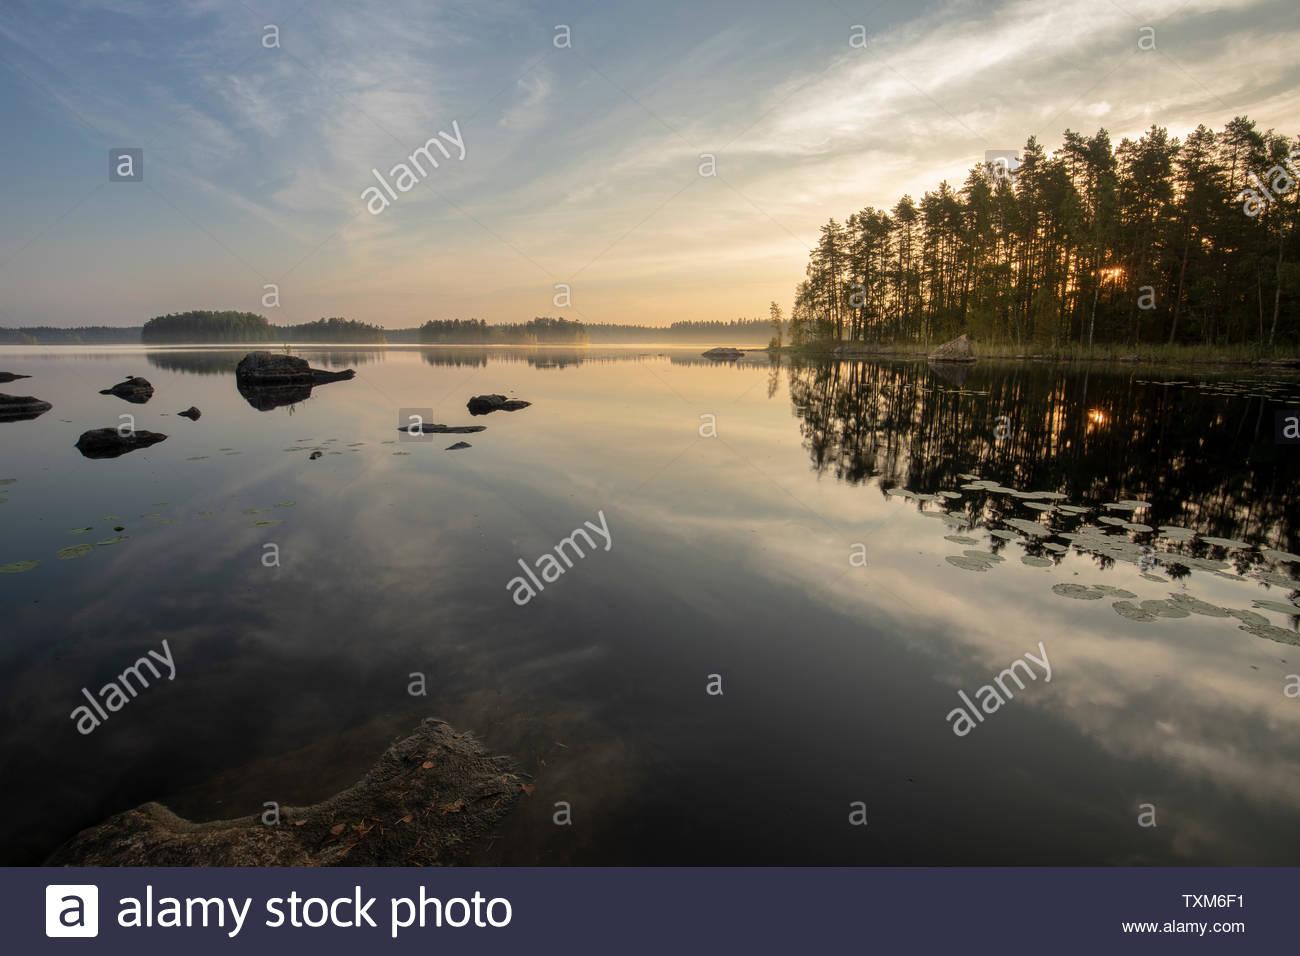 Lake view finland - Stock Image